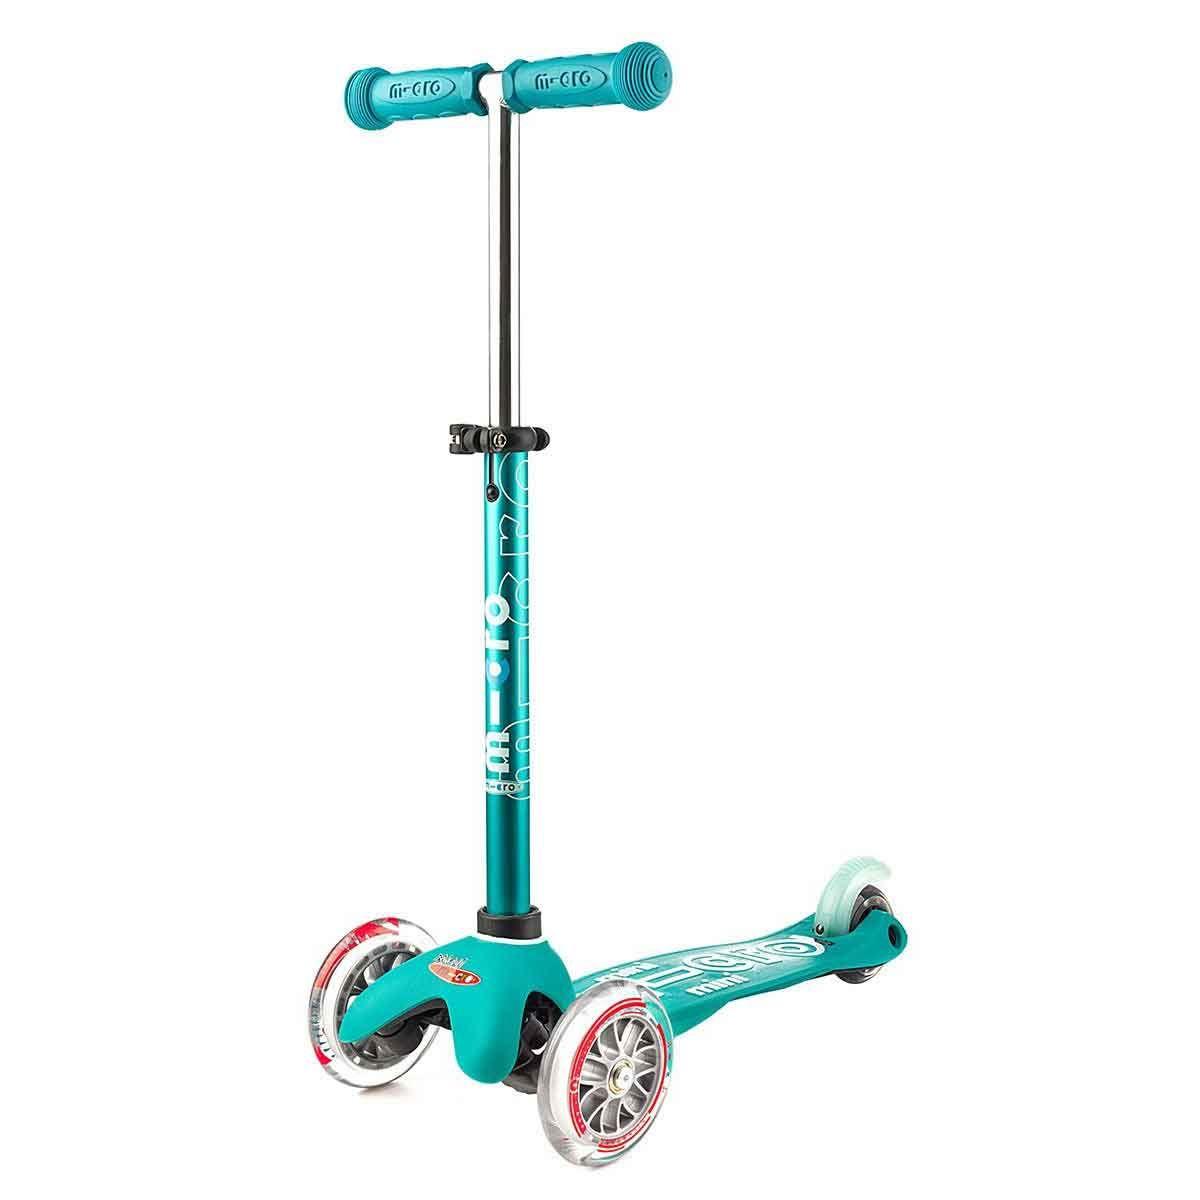 Aqua micro mini deluxe scooter scooters aqua and minis